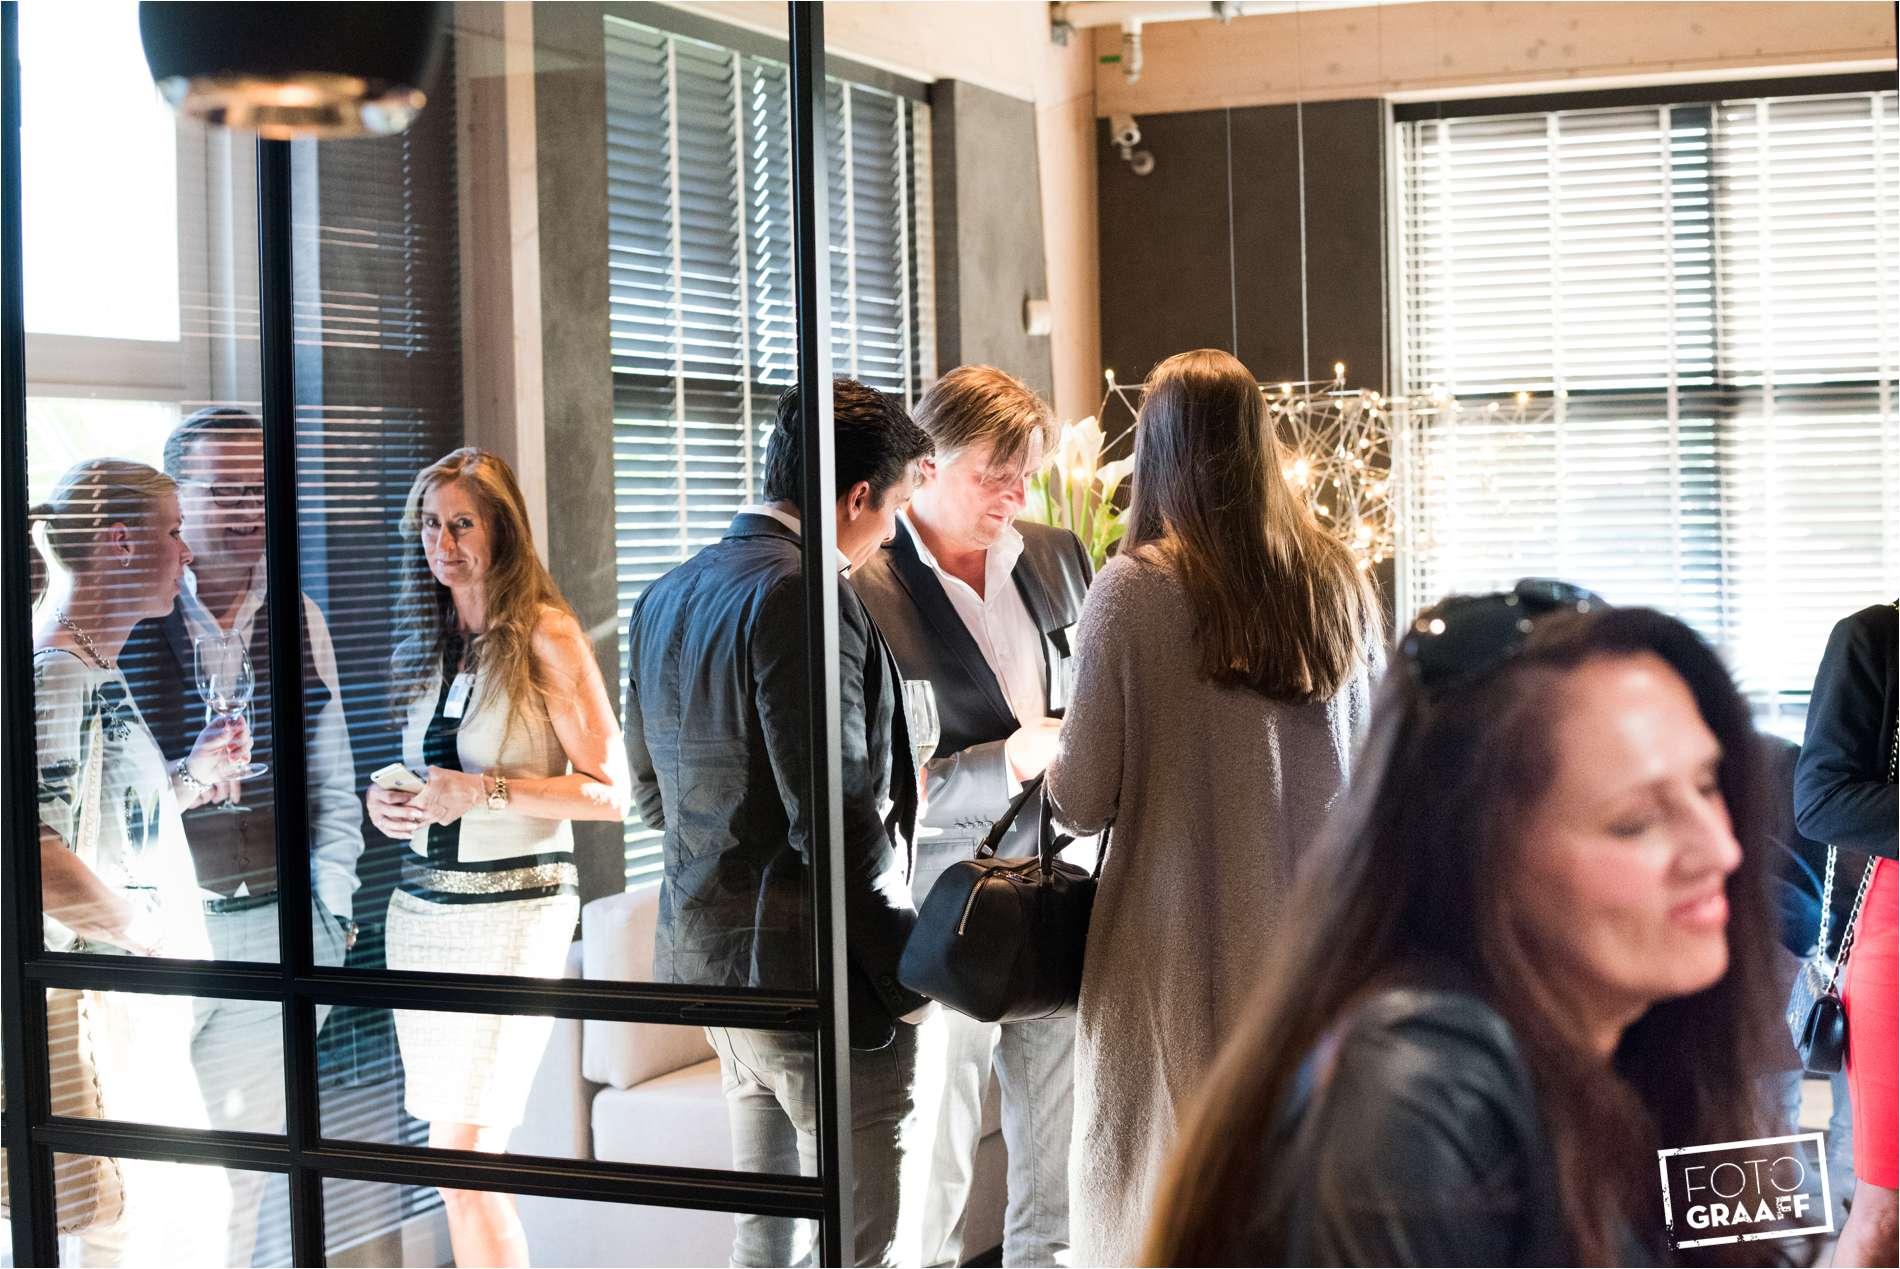 Tieleman Keukens Showroom : Tieleman keukens opening exlusieve showroom Fotograaff